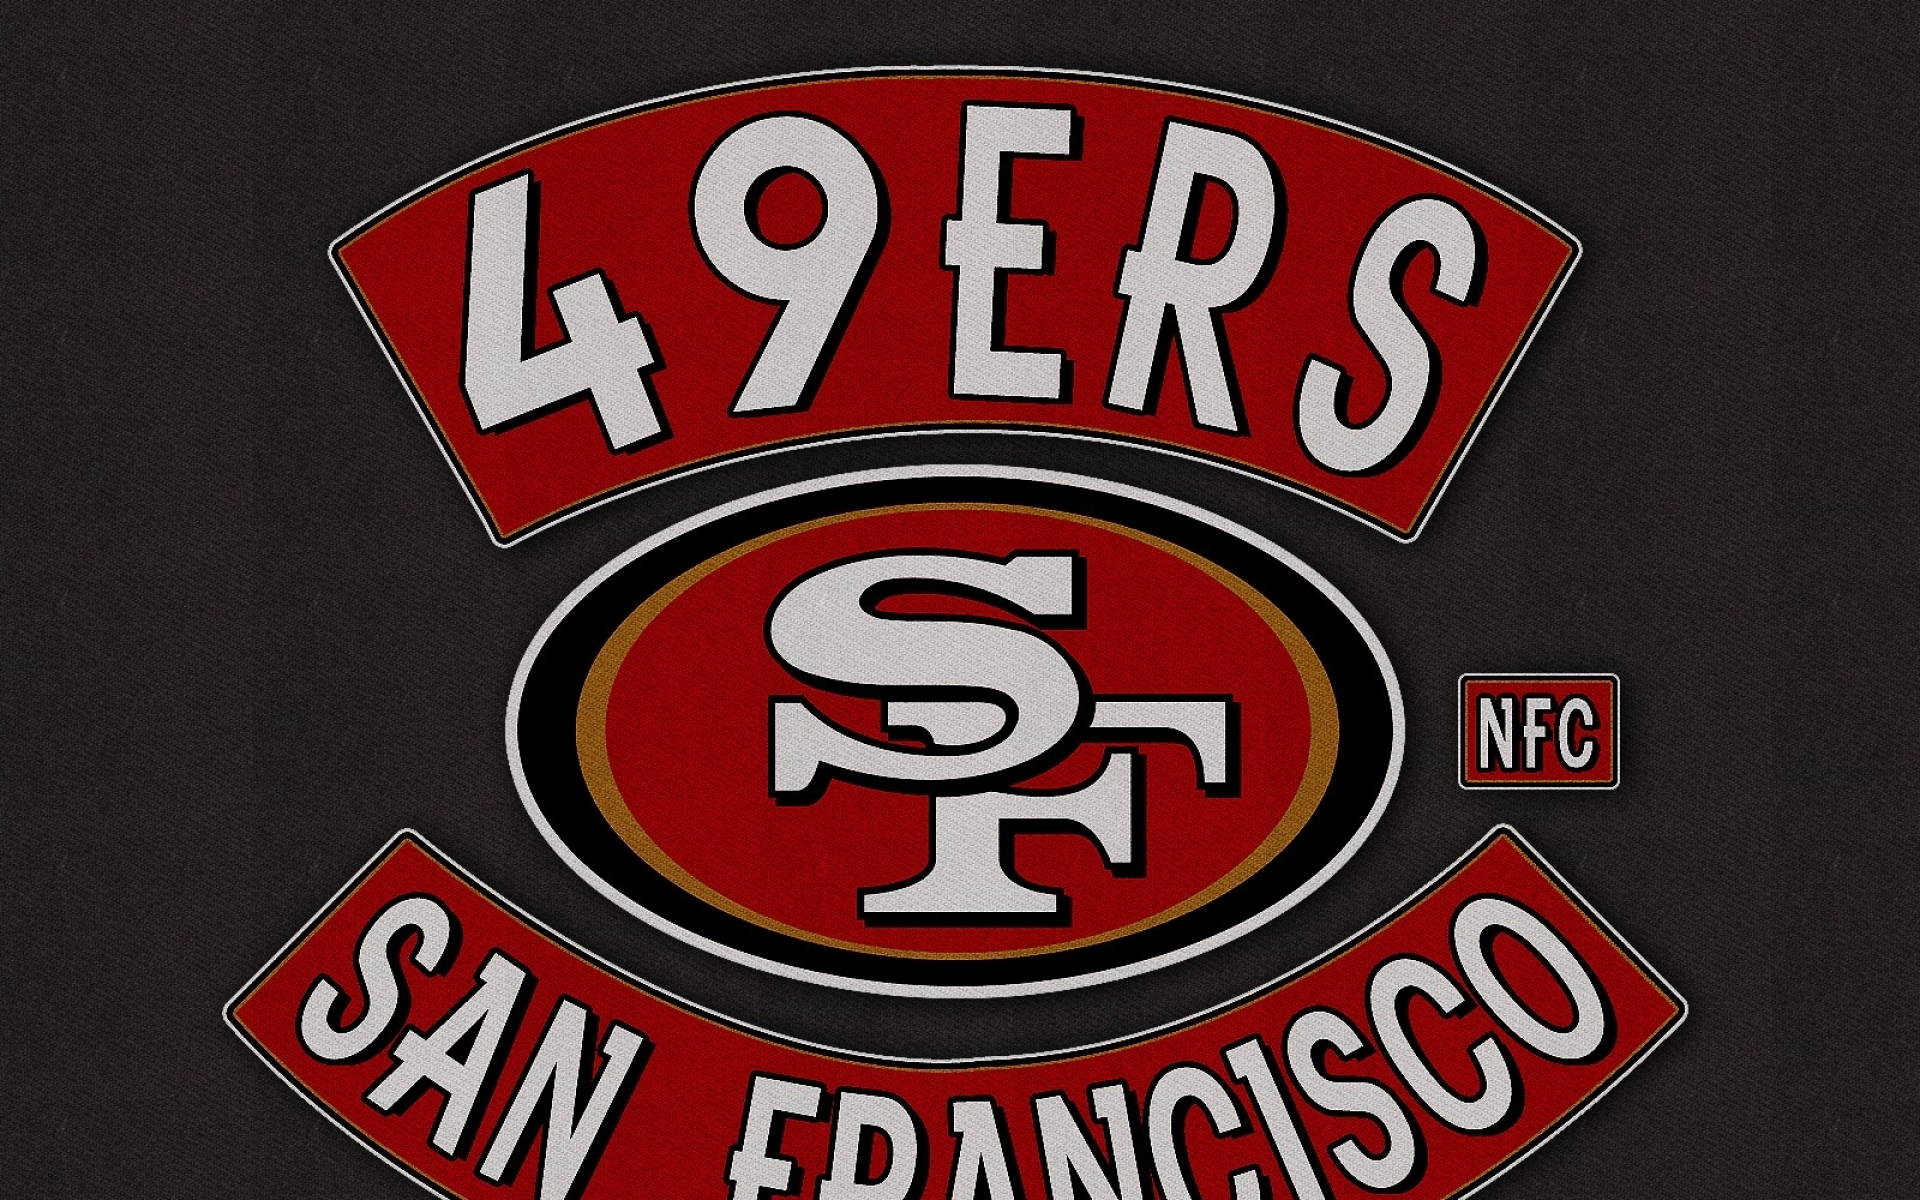 SAN FRANCISCO 49ers nfl football ru wallpaper 1920x1200 154206 1920x1200